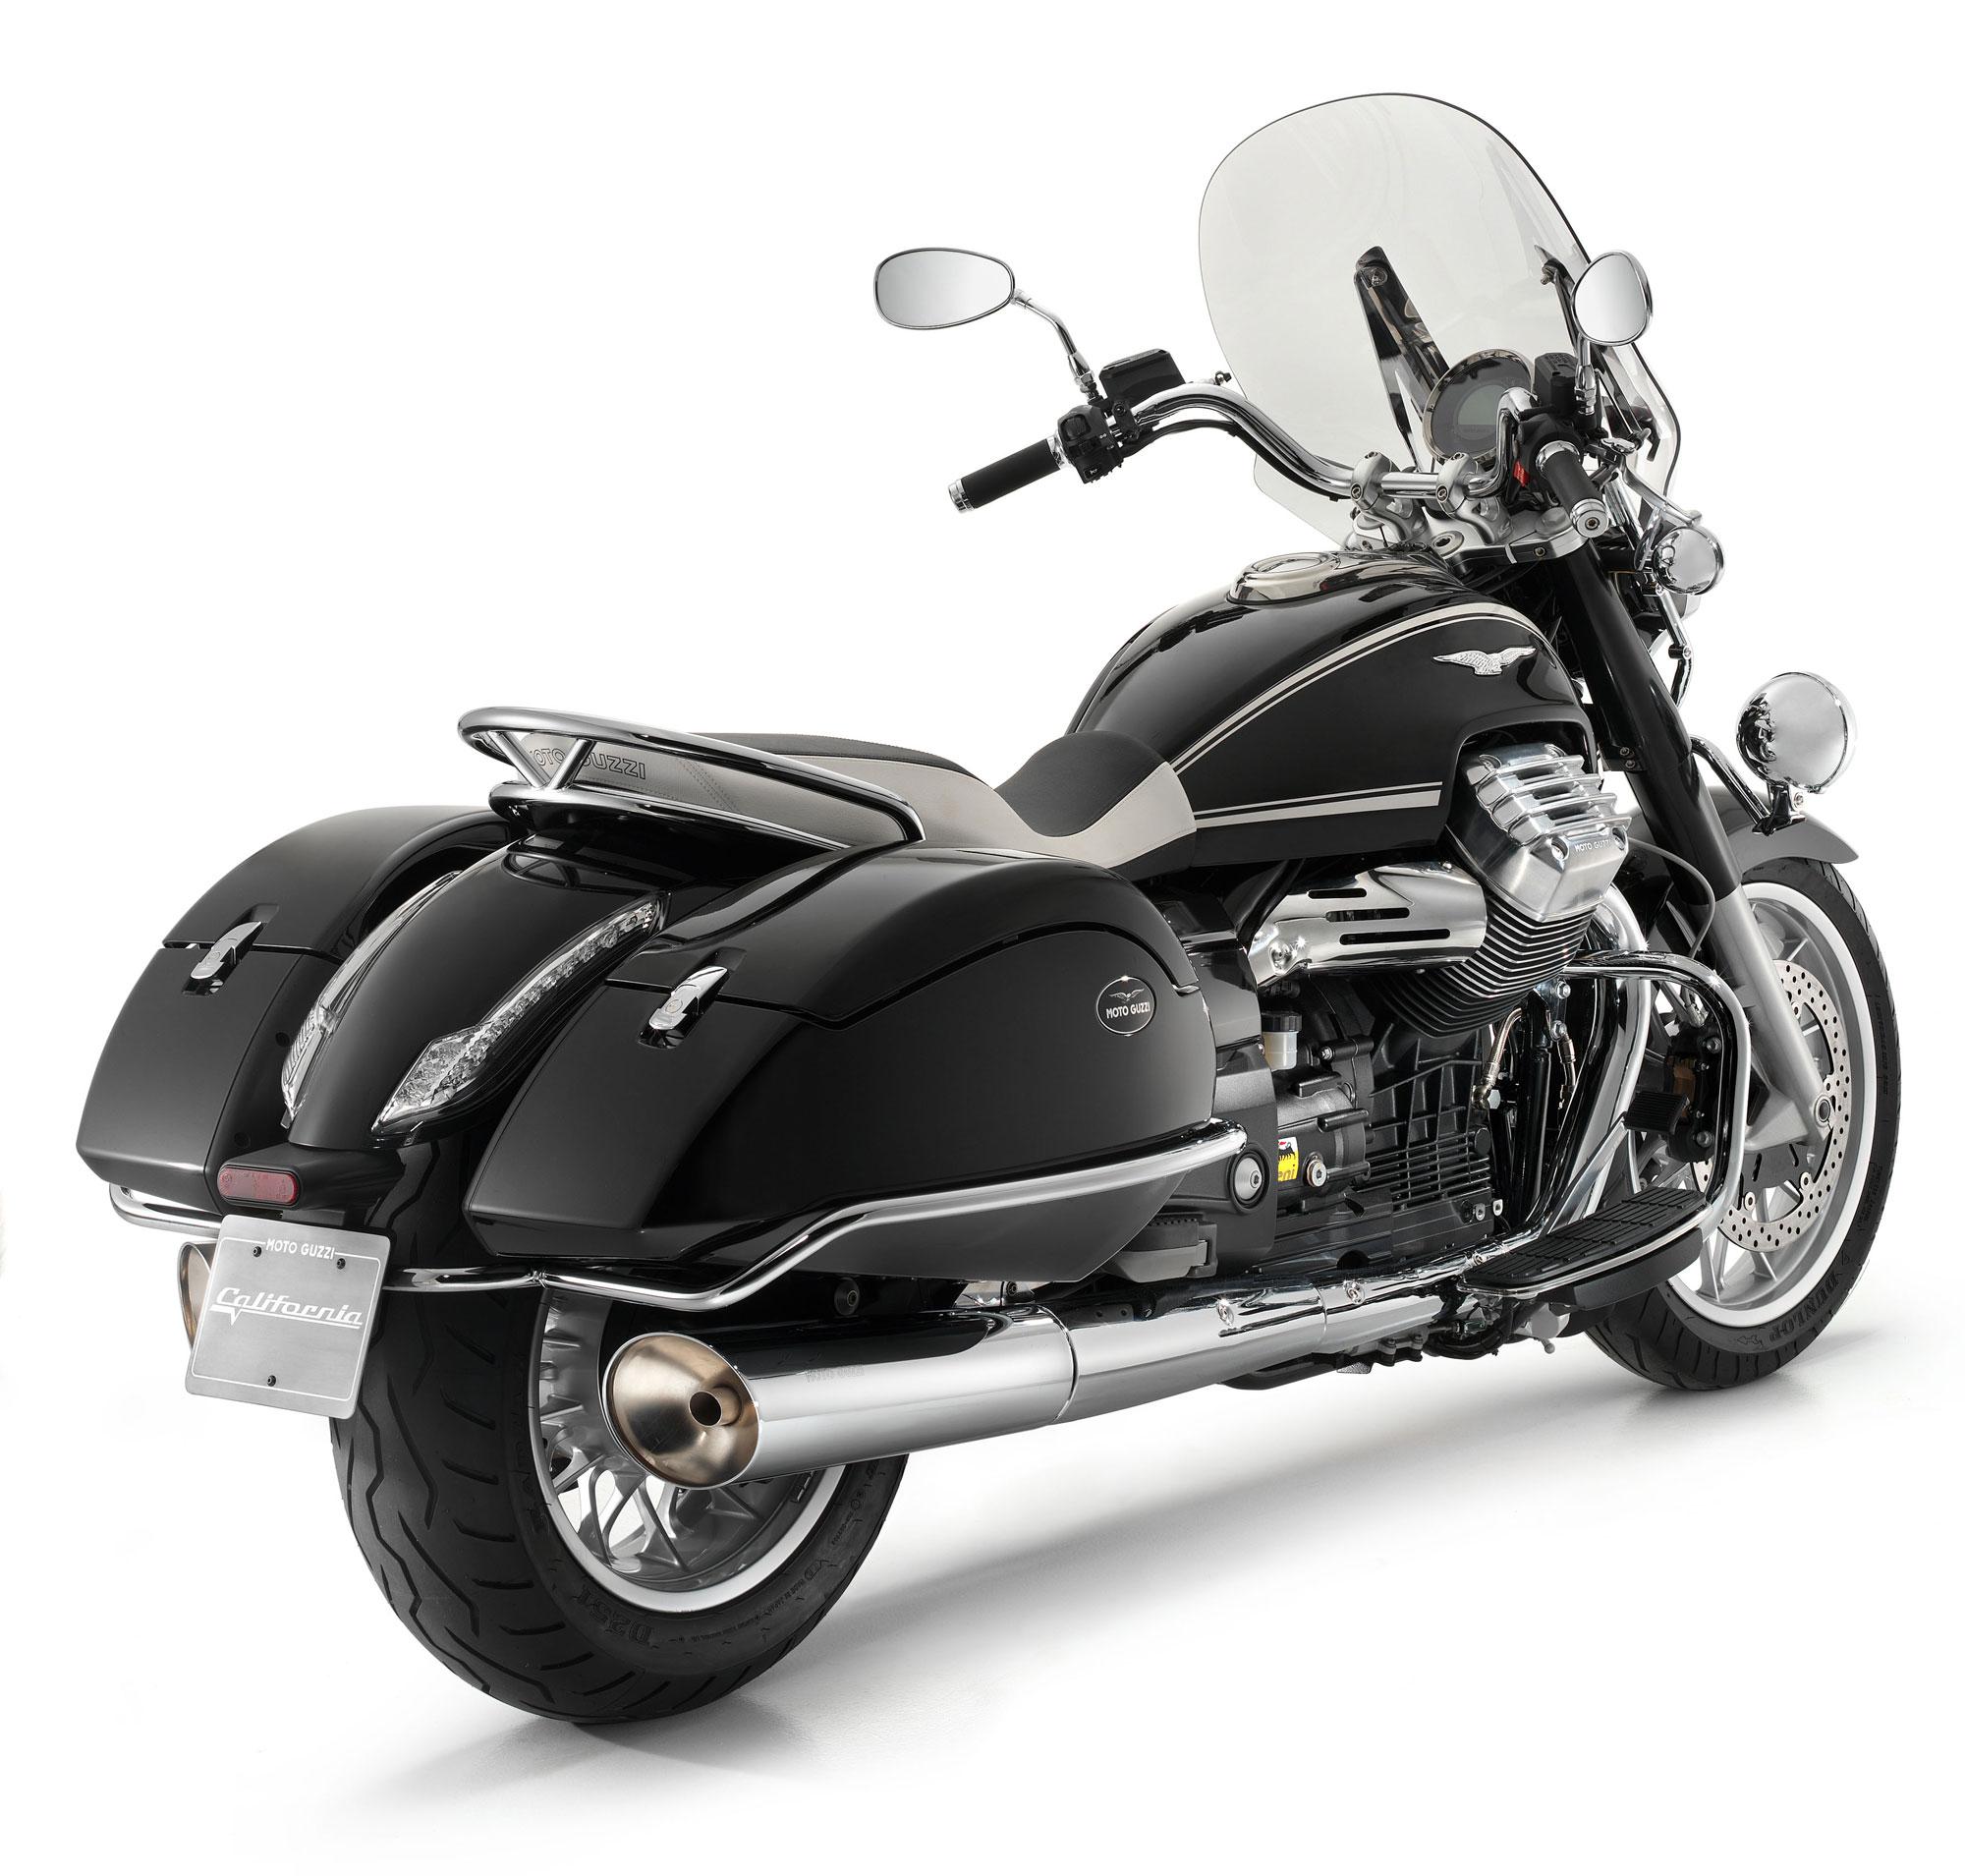 moto guzzi california 1400 touring specs 2012 2013 autoevolution. Black Bedroom Furniture Sets. Home Design Ideas